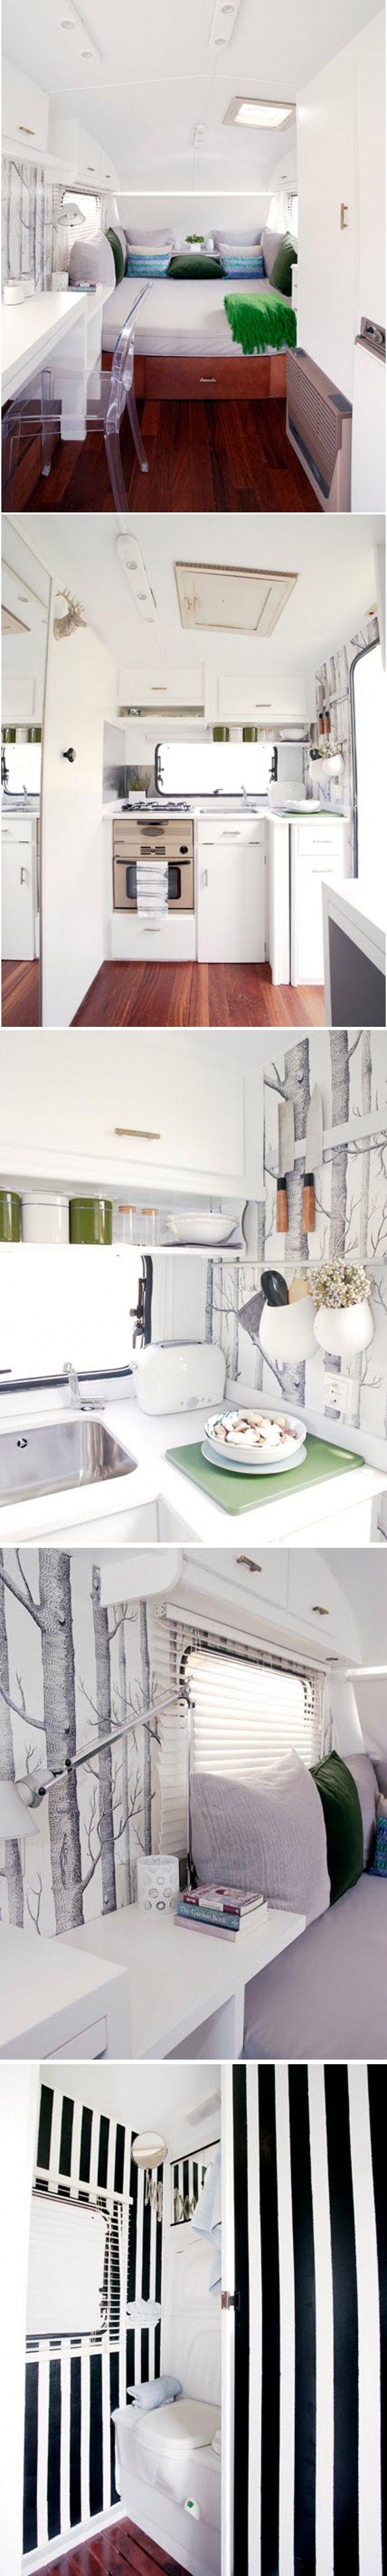 Gypsy Interior Design Dress My Wagon| Serafini Amelia| RV Travel Trailer Design Inspiration-interior of a camper.